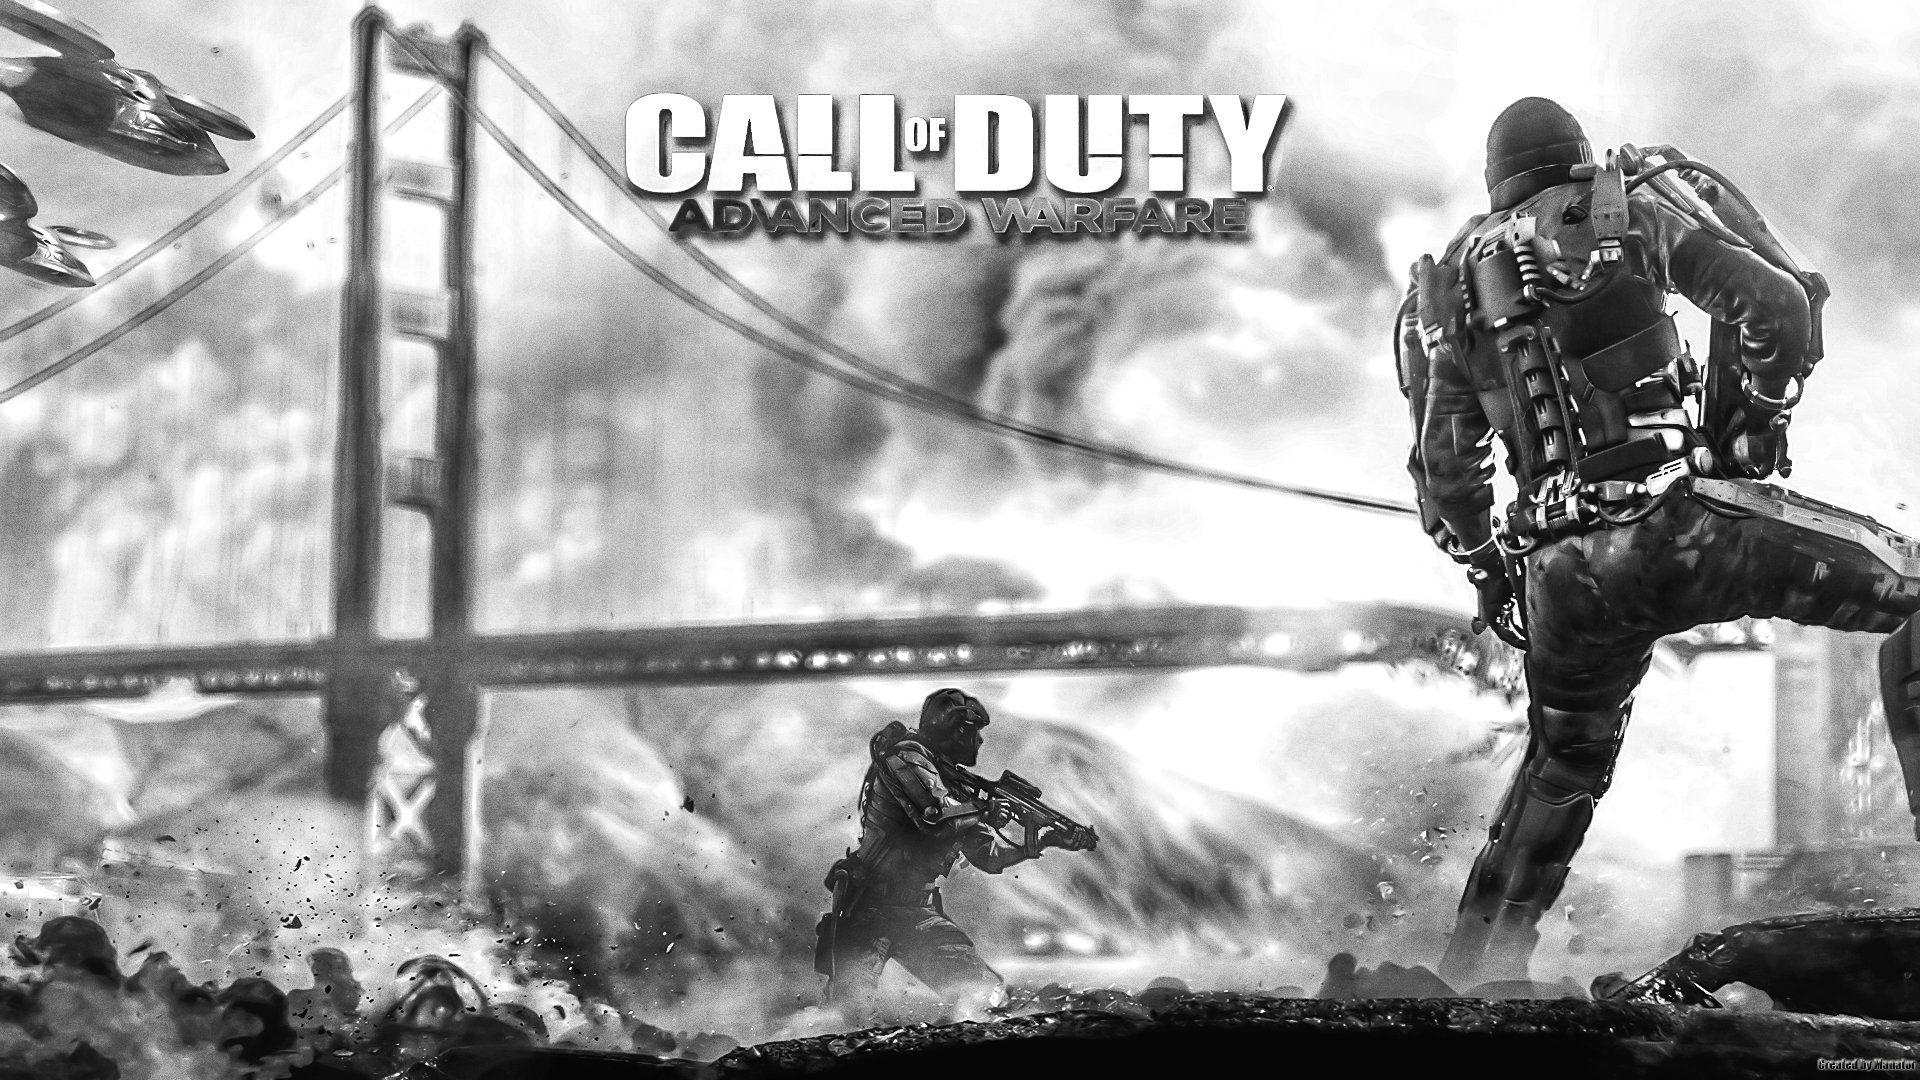 Call Of Duty Advanced Warfare Wallpaper By Brovvnie On DeviantArt 1920x1200 39 Wallpapers